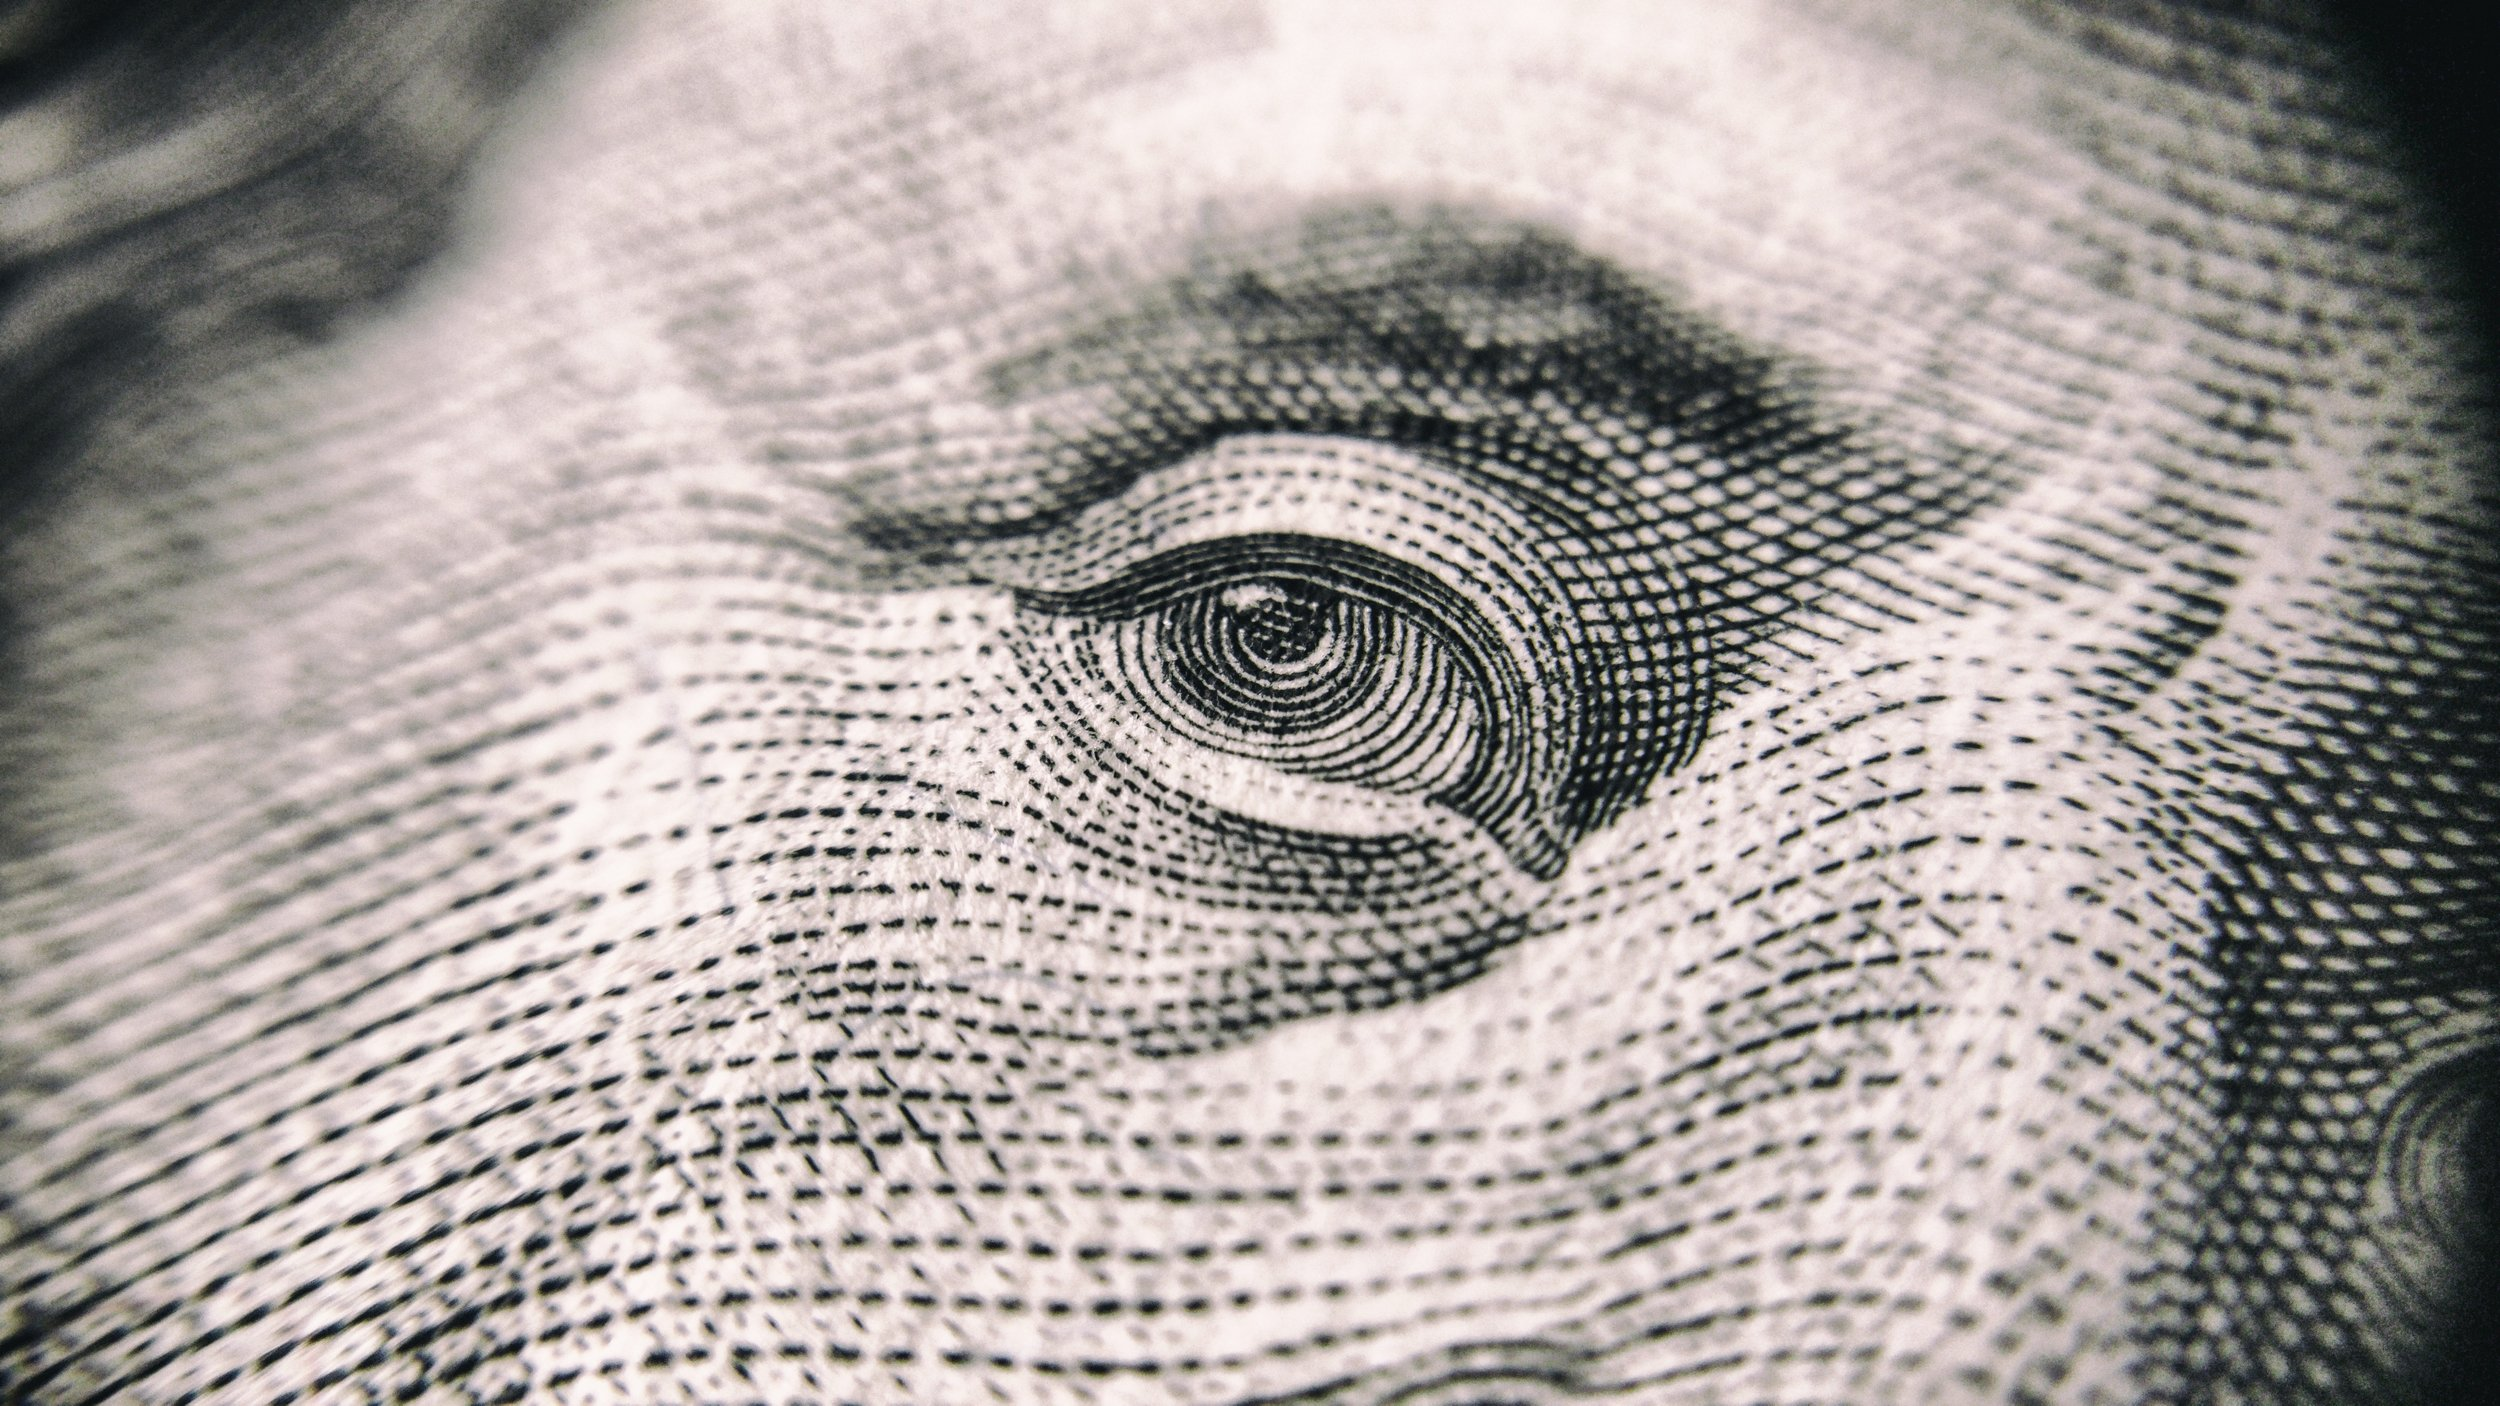 All about the Benjamins! Photo by  Vladislav Reshetnyak .